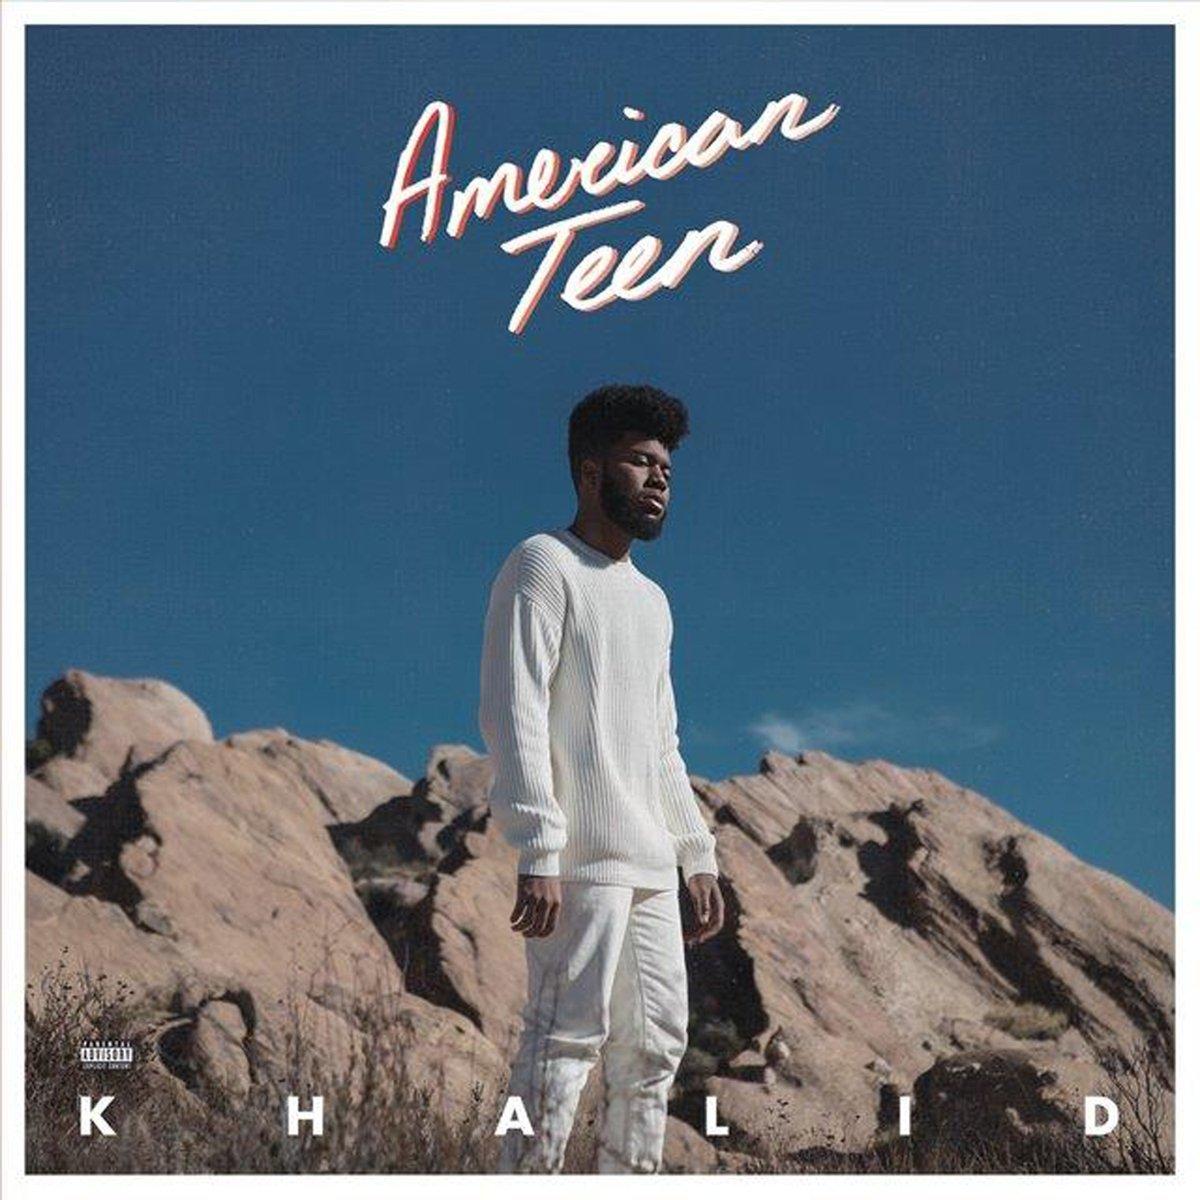 Vinilo : Khalid - American Teen [Explicit Content] (Gatefold LP Jacket, Download Insert, 2 Disc)